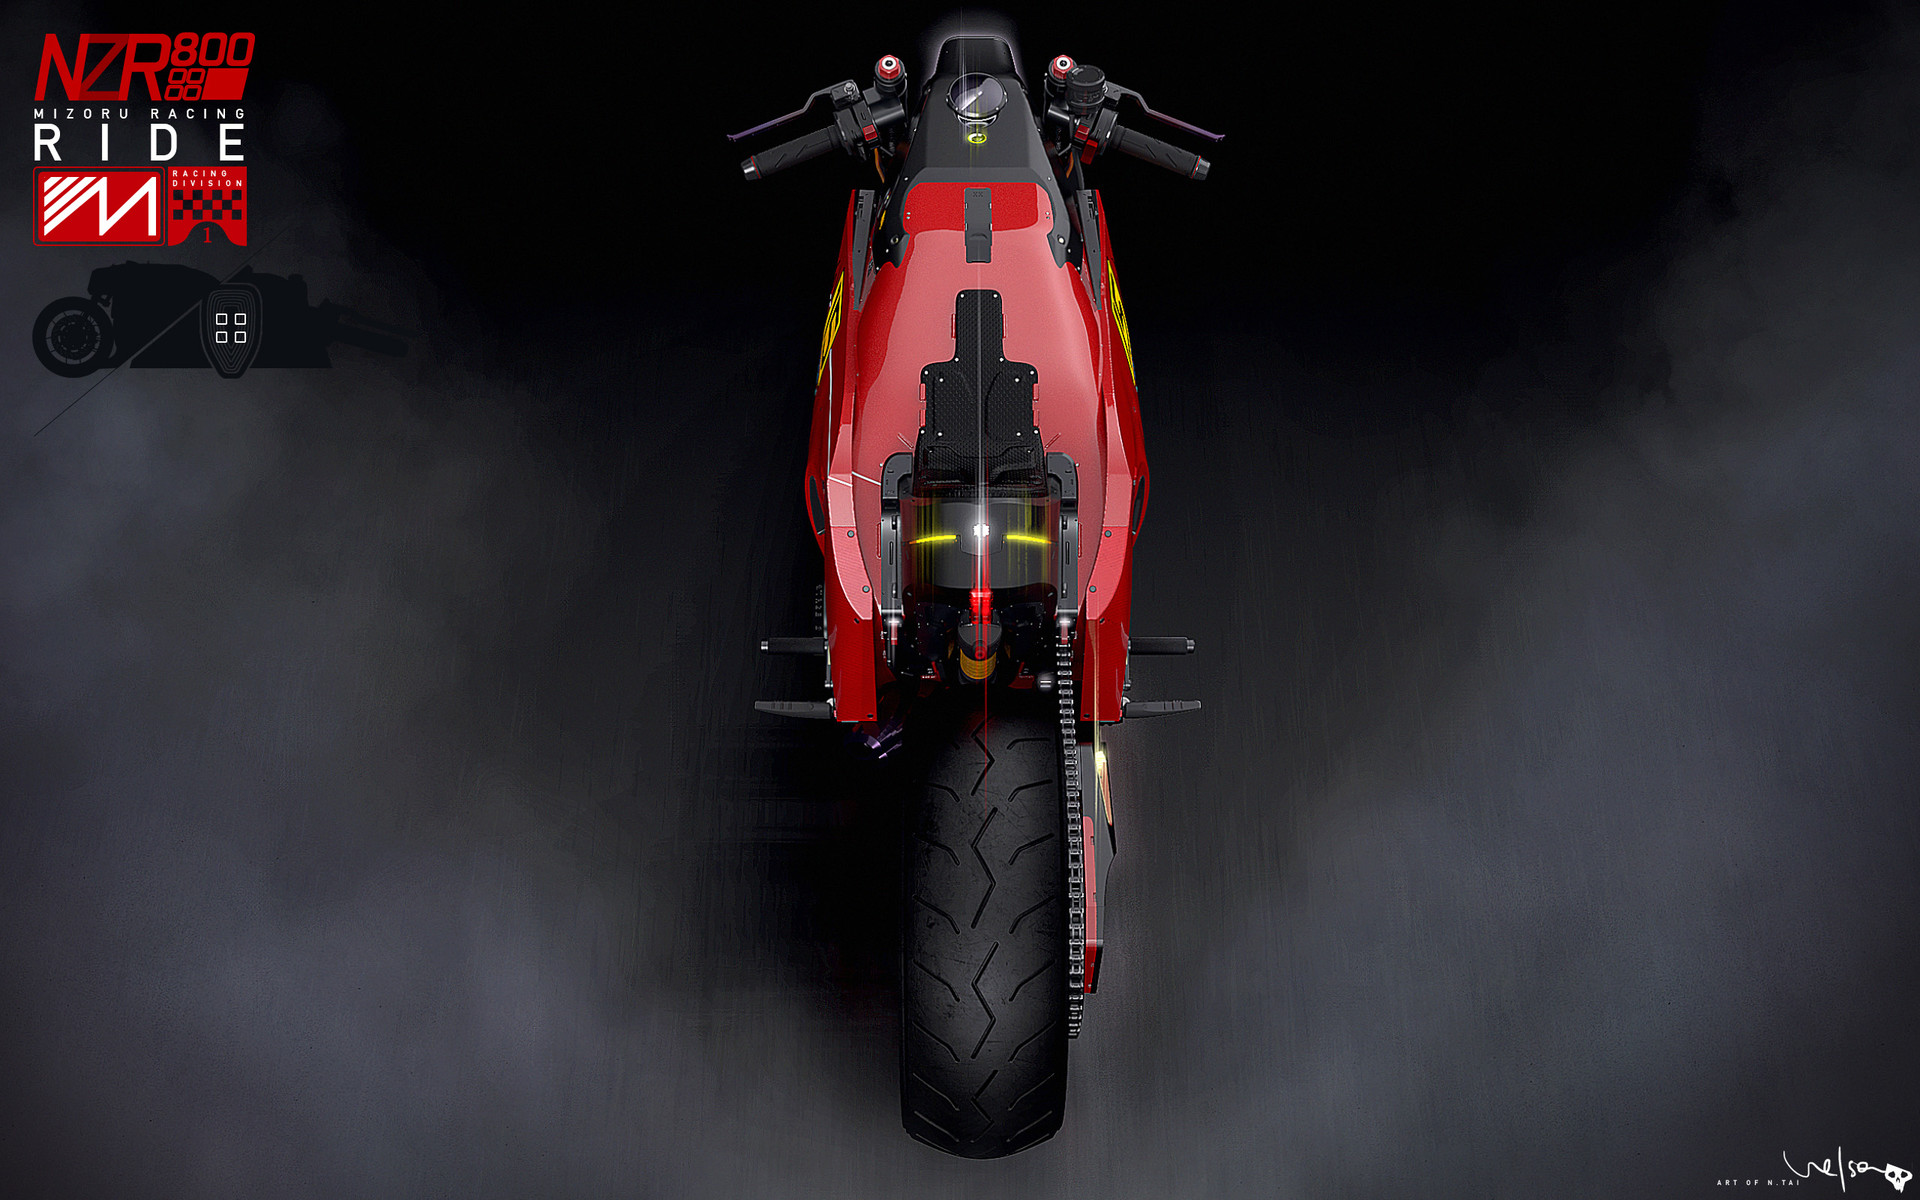 Nelson tai nzr500 dsgn bike top 001a